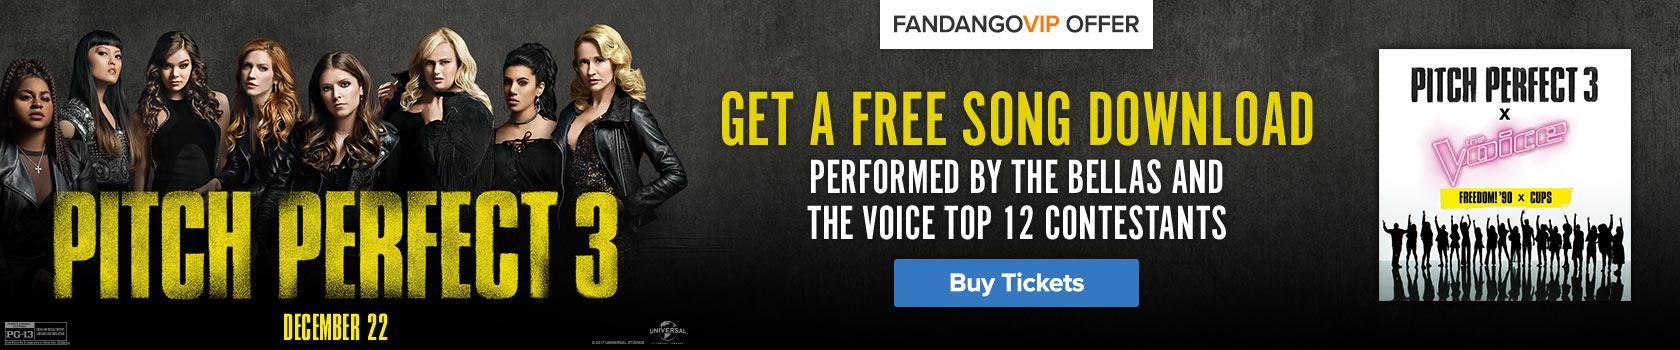 Fandango Pitch Perfect 3 Free Song